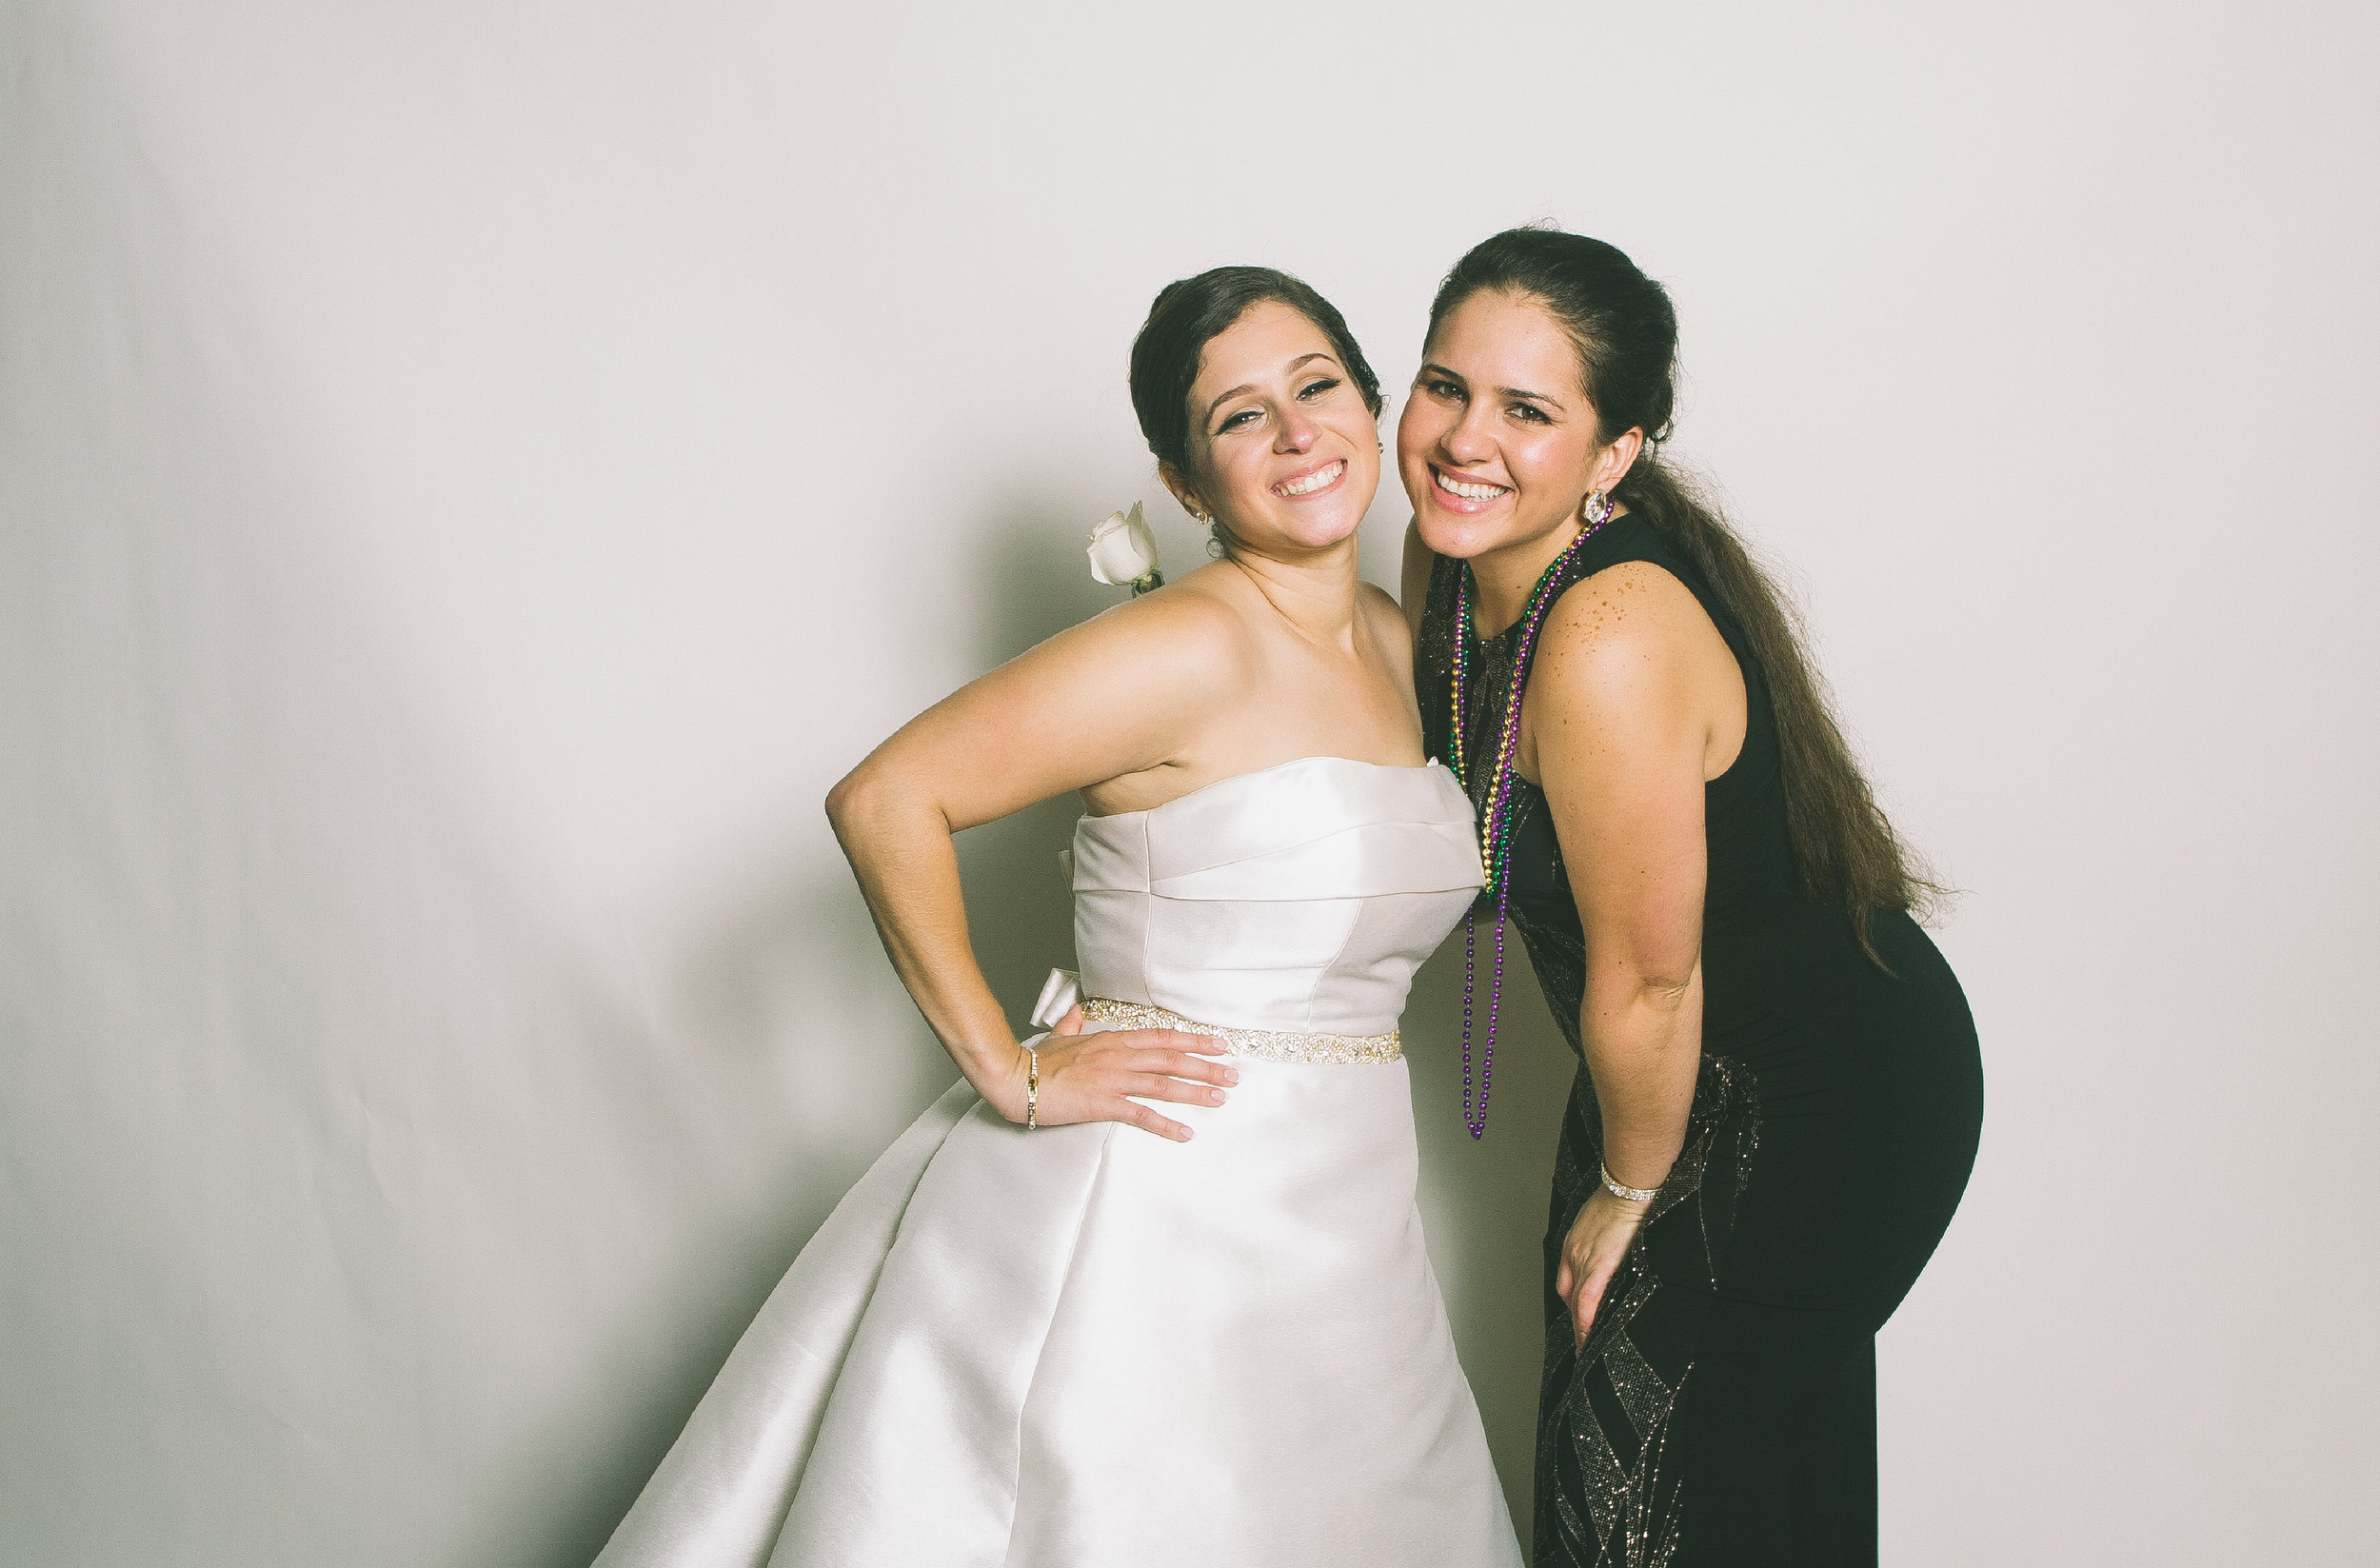 Marelys + Oscar Wedding Wackybooth Photobooth48.jpg